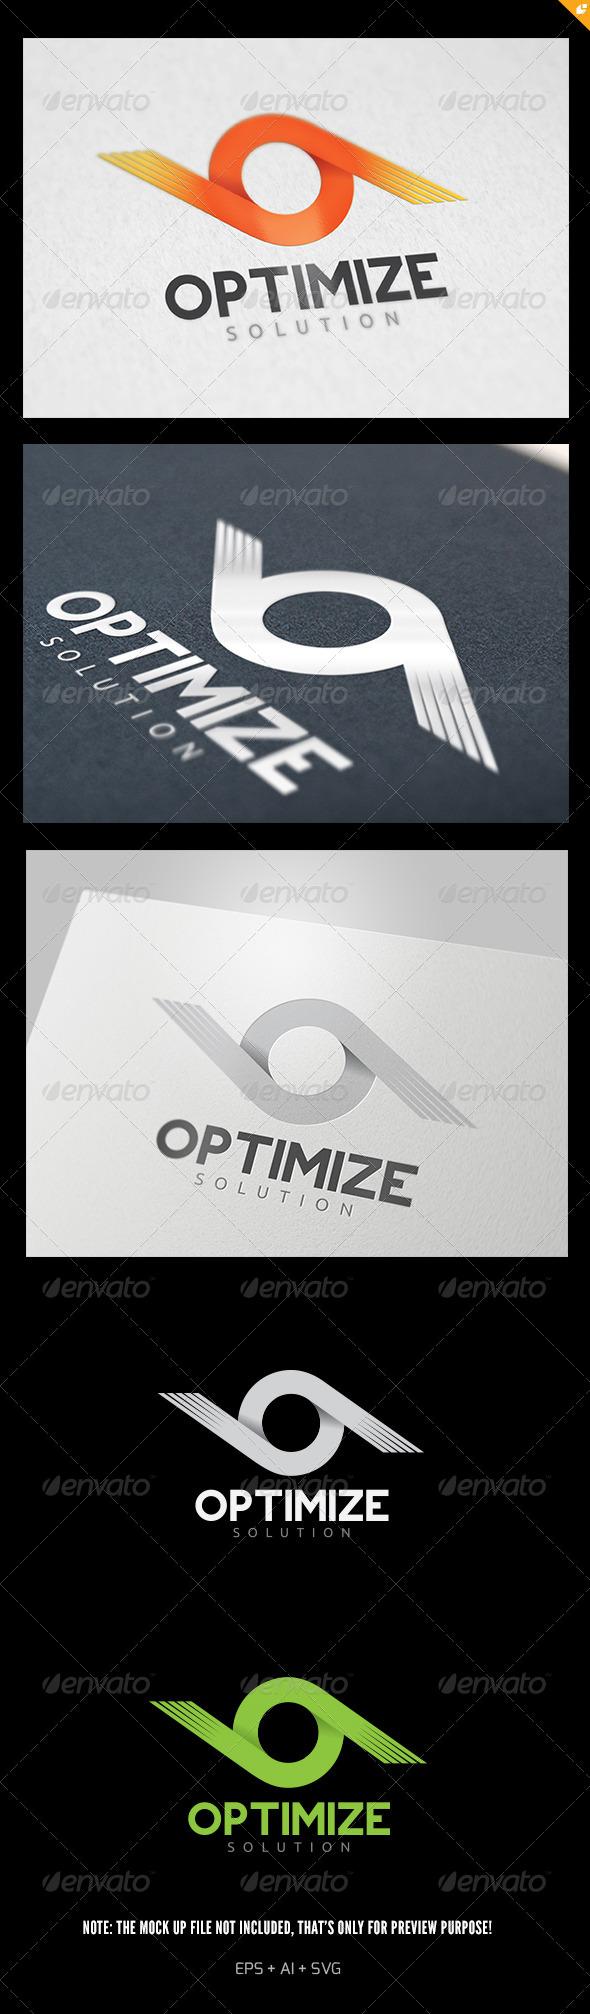 GraphicRiver Optimize Solution Logo 5812828